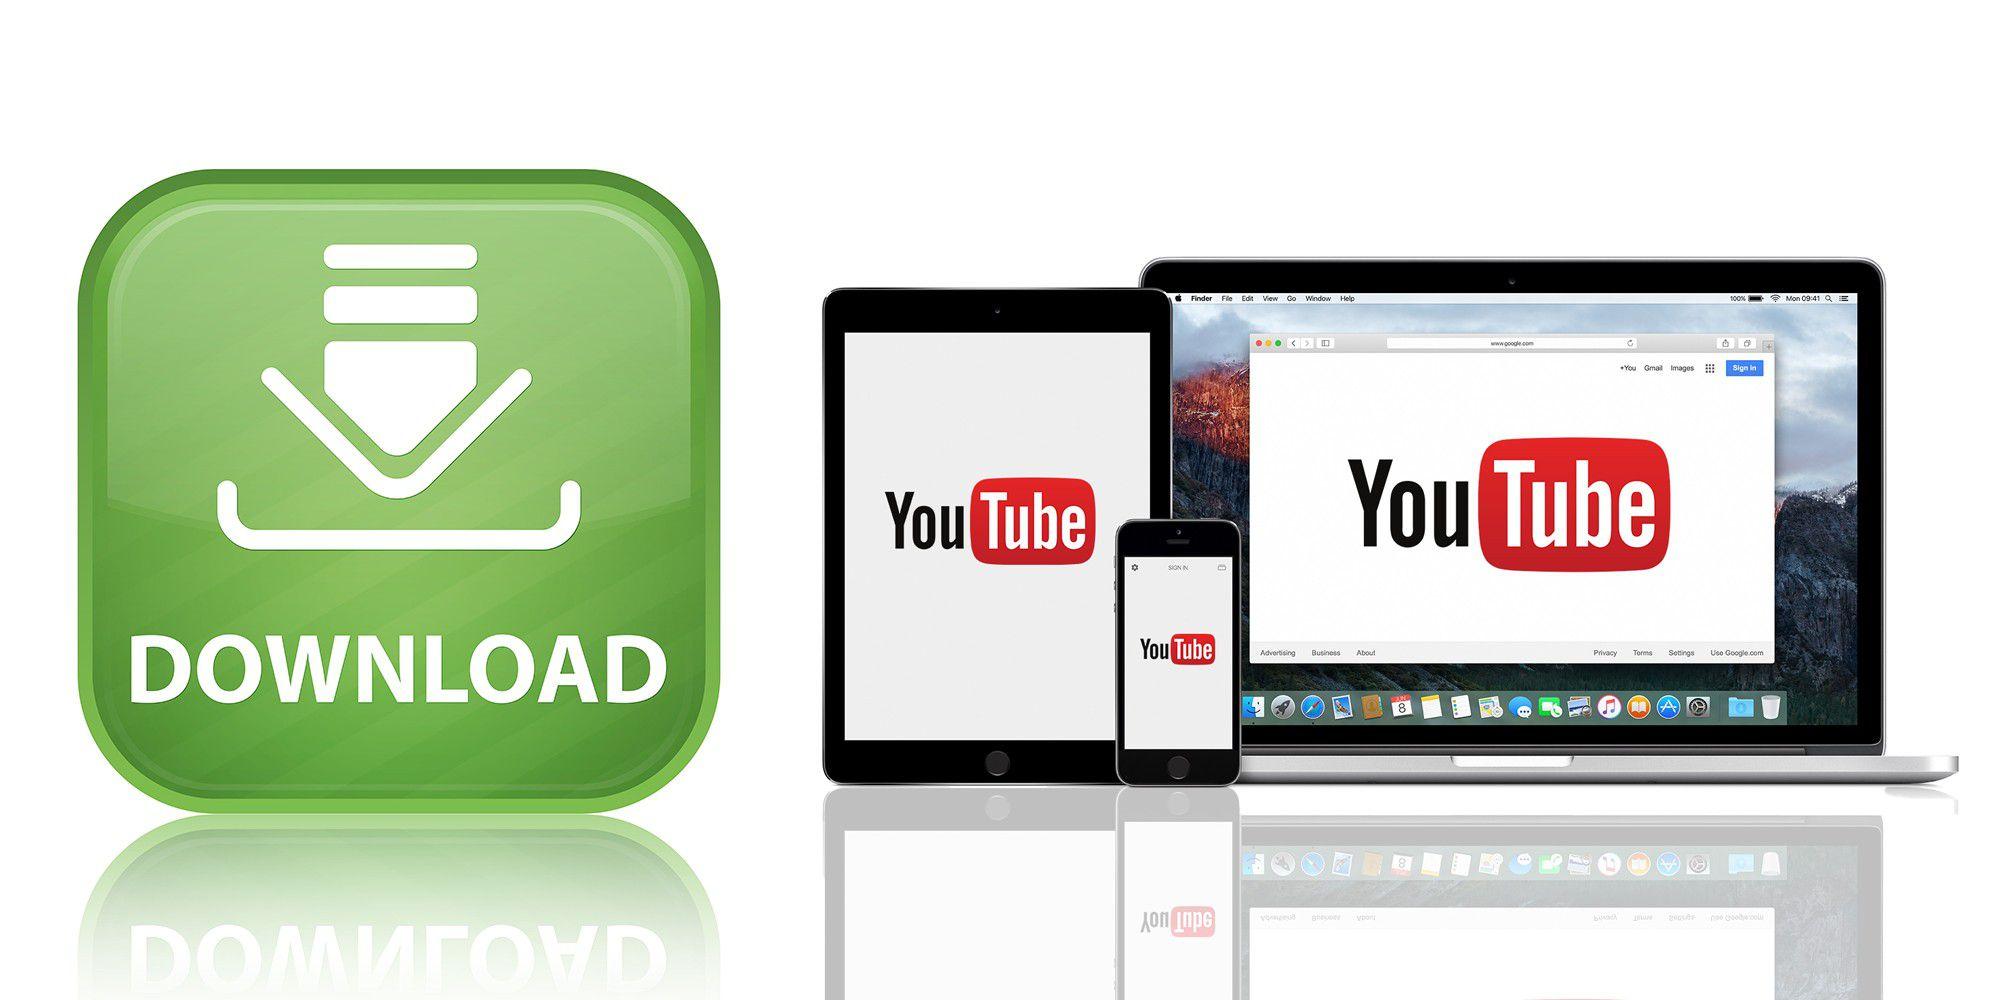 Youtube Videos kostenlos downloaden So geht's   Macwelt